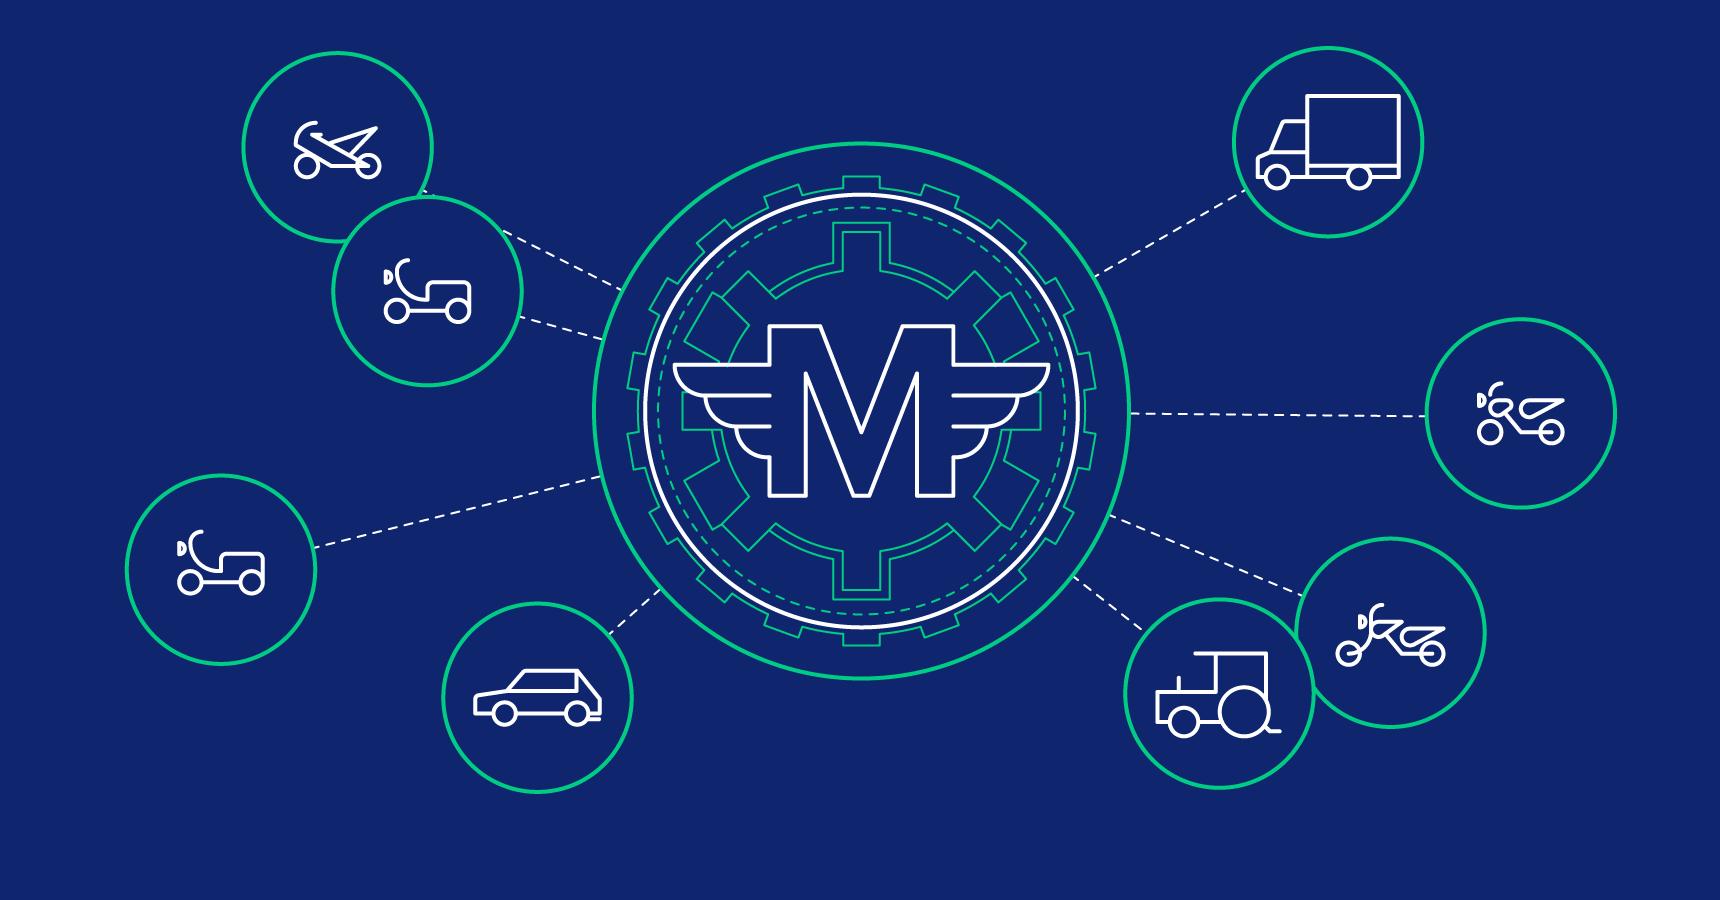 Motoro: The Future of IoT in Transportation | Toptal